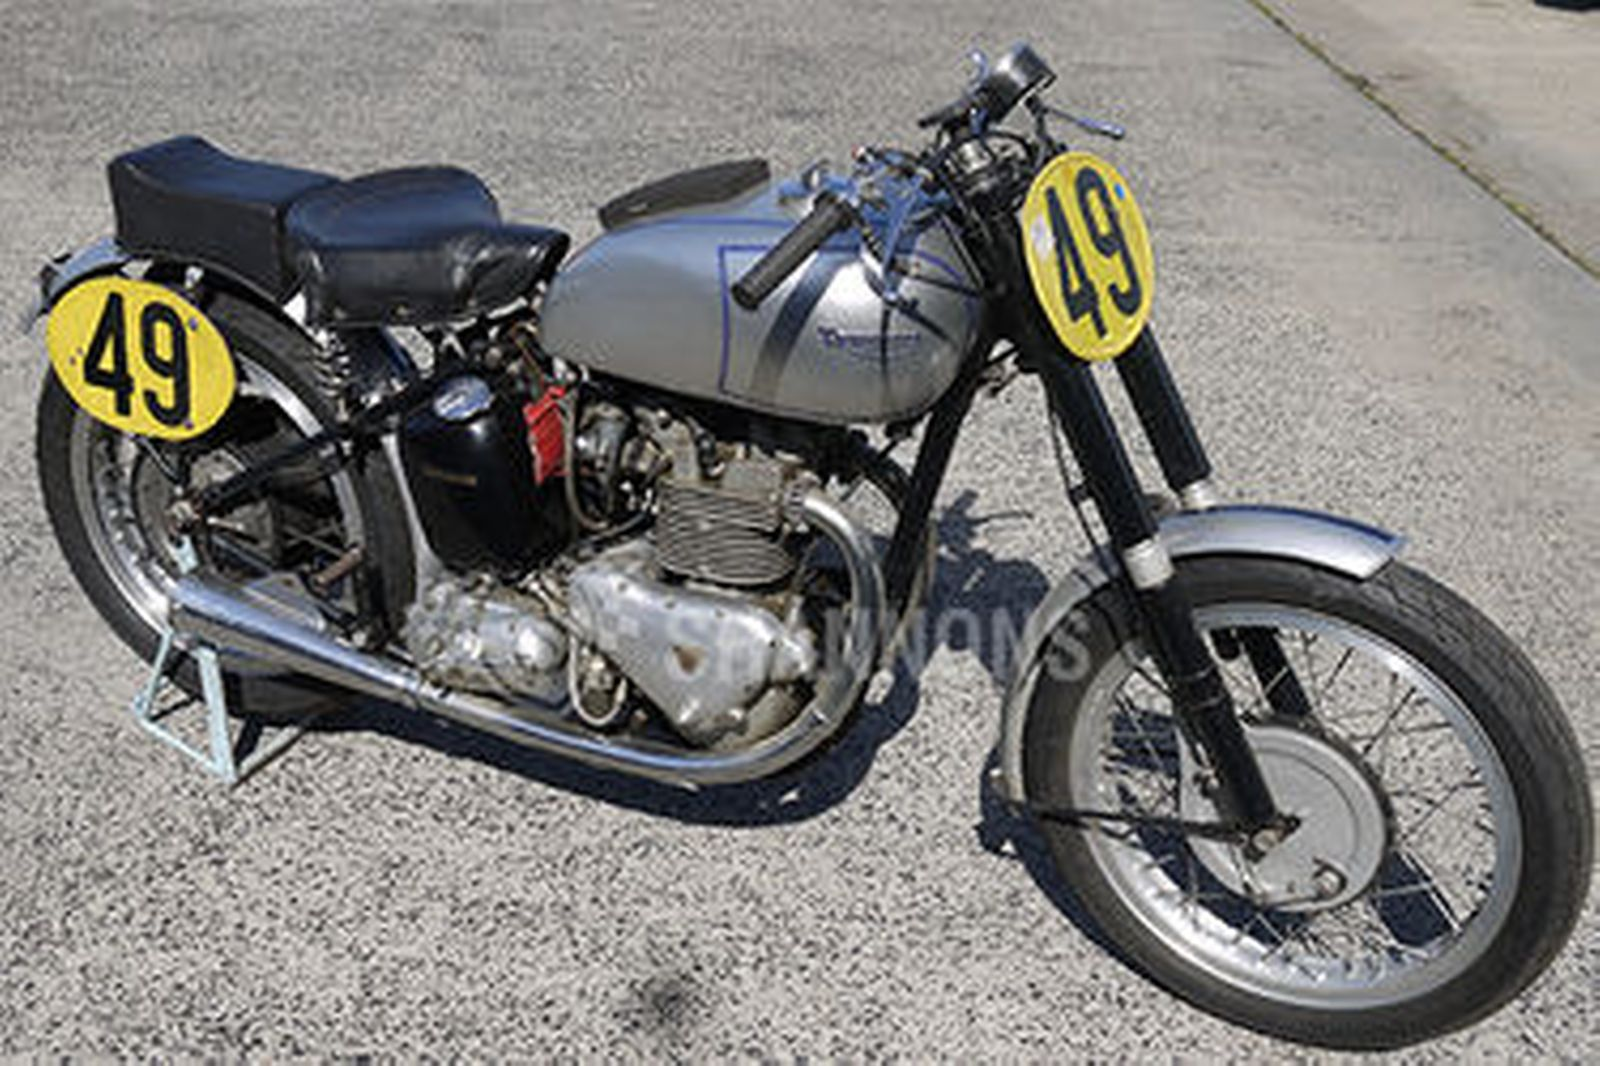 Triumph Tiger 'GP Replica' 500cc Motorcycle